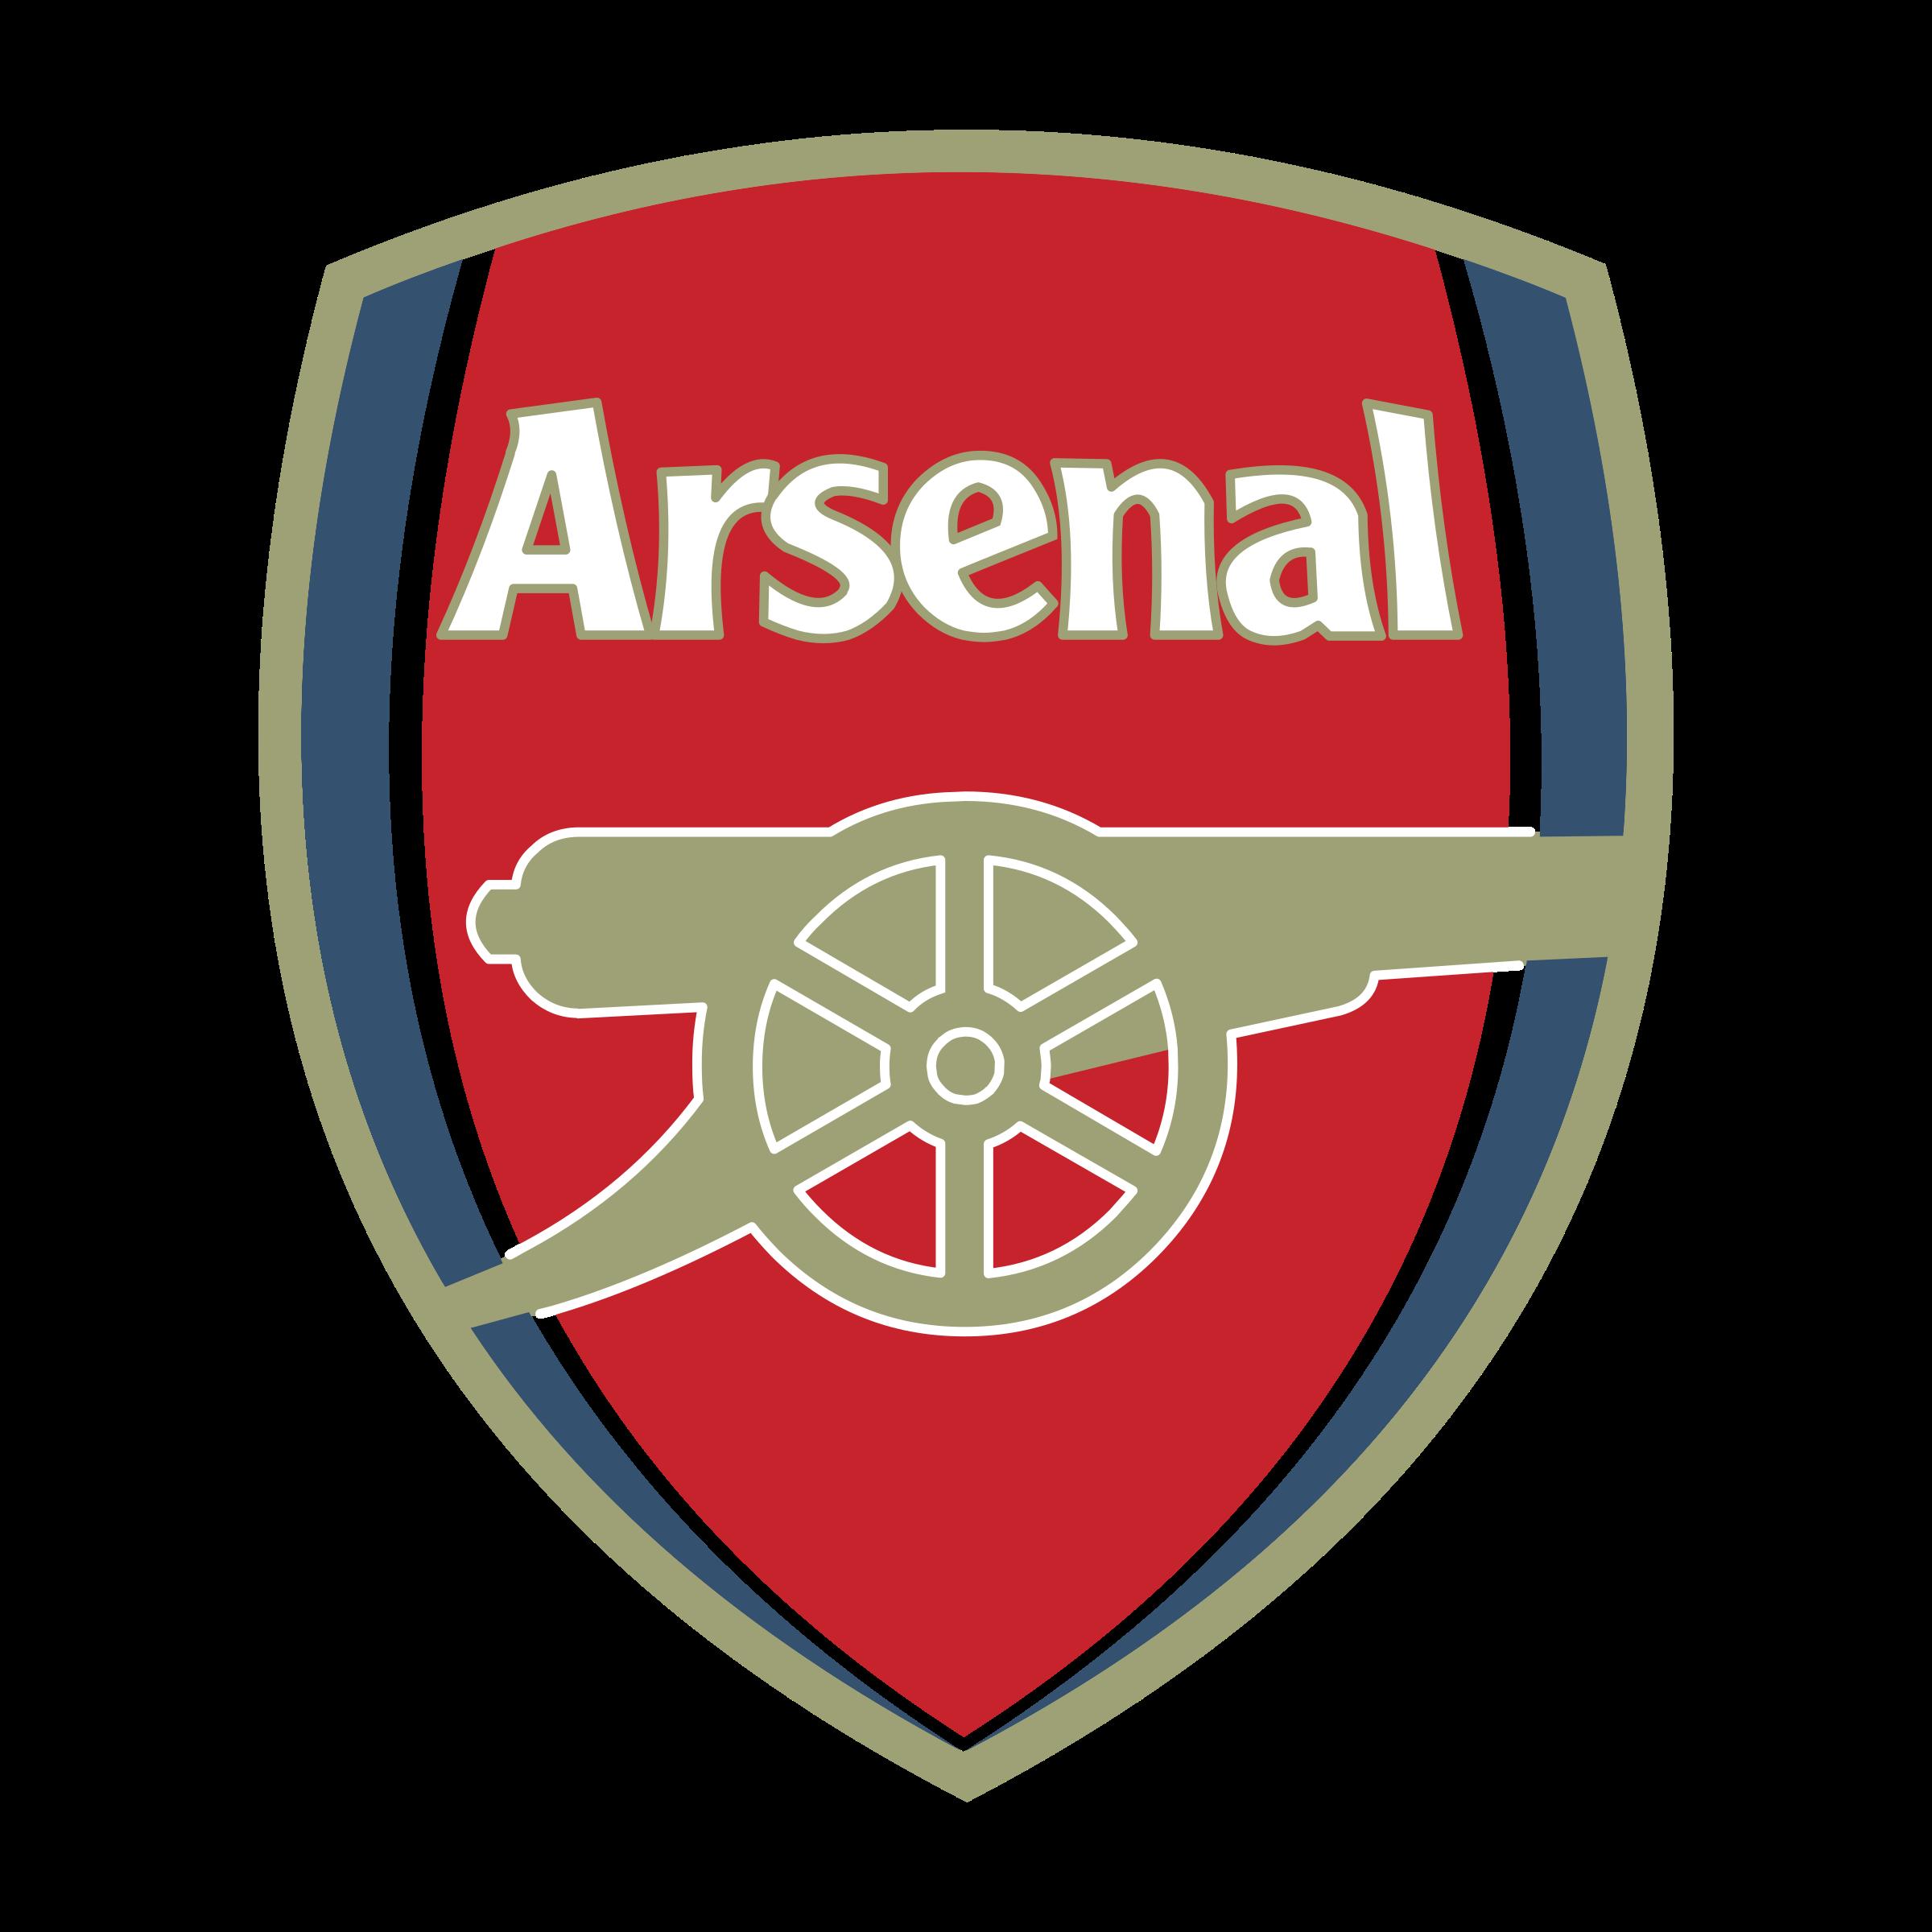 Arsenal Logo Png Transparent Svg Vector Freebie Supply